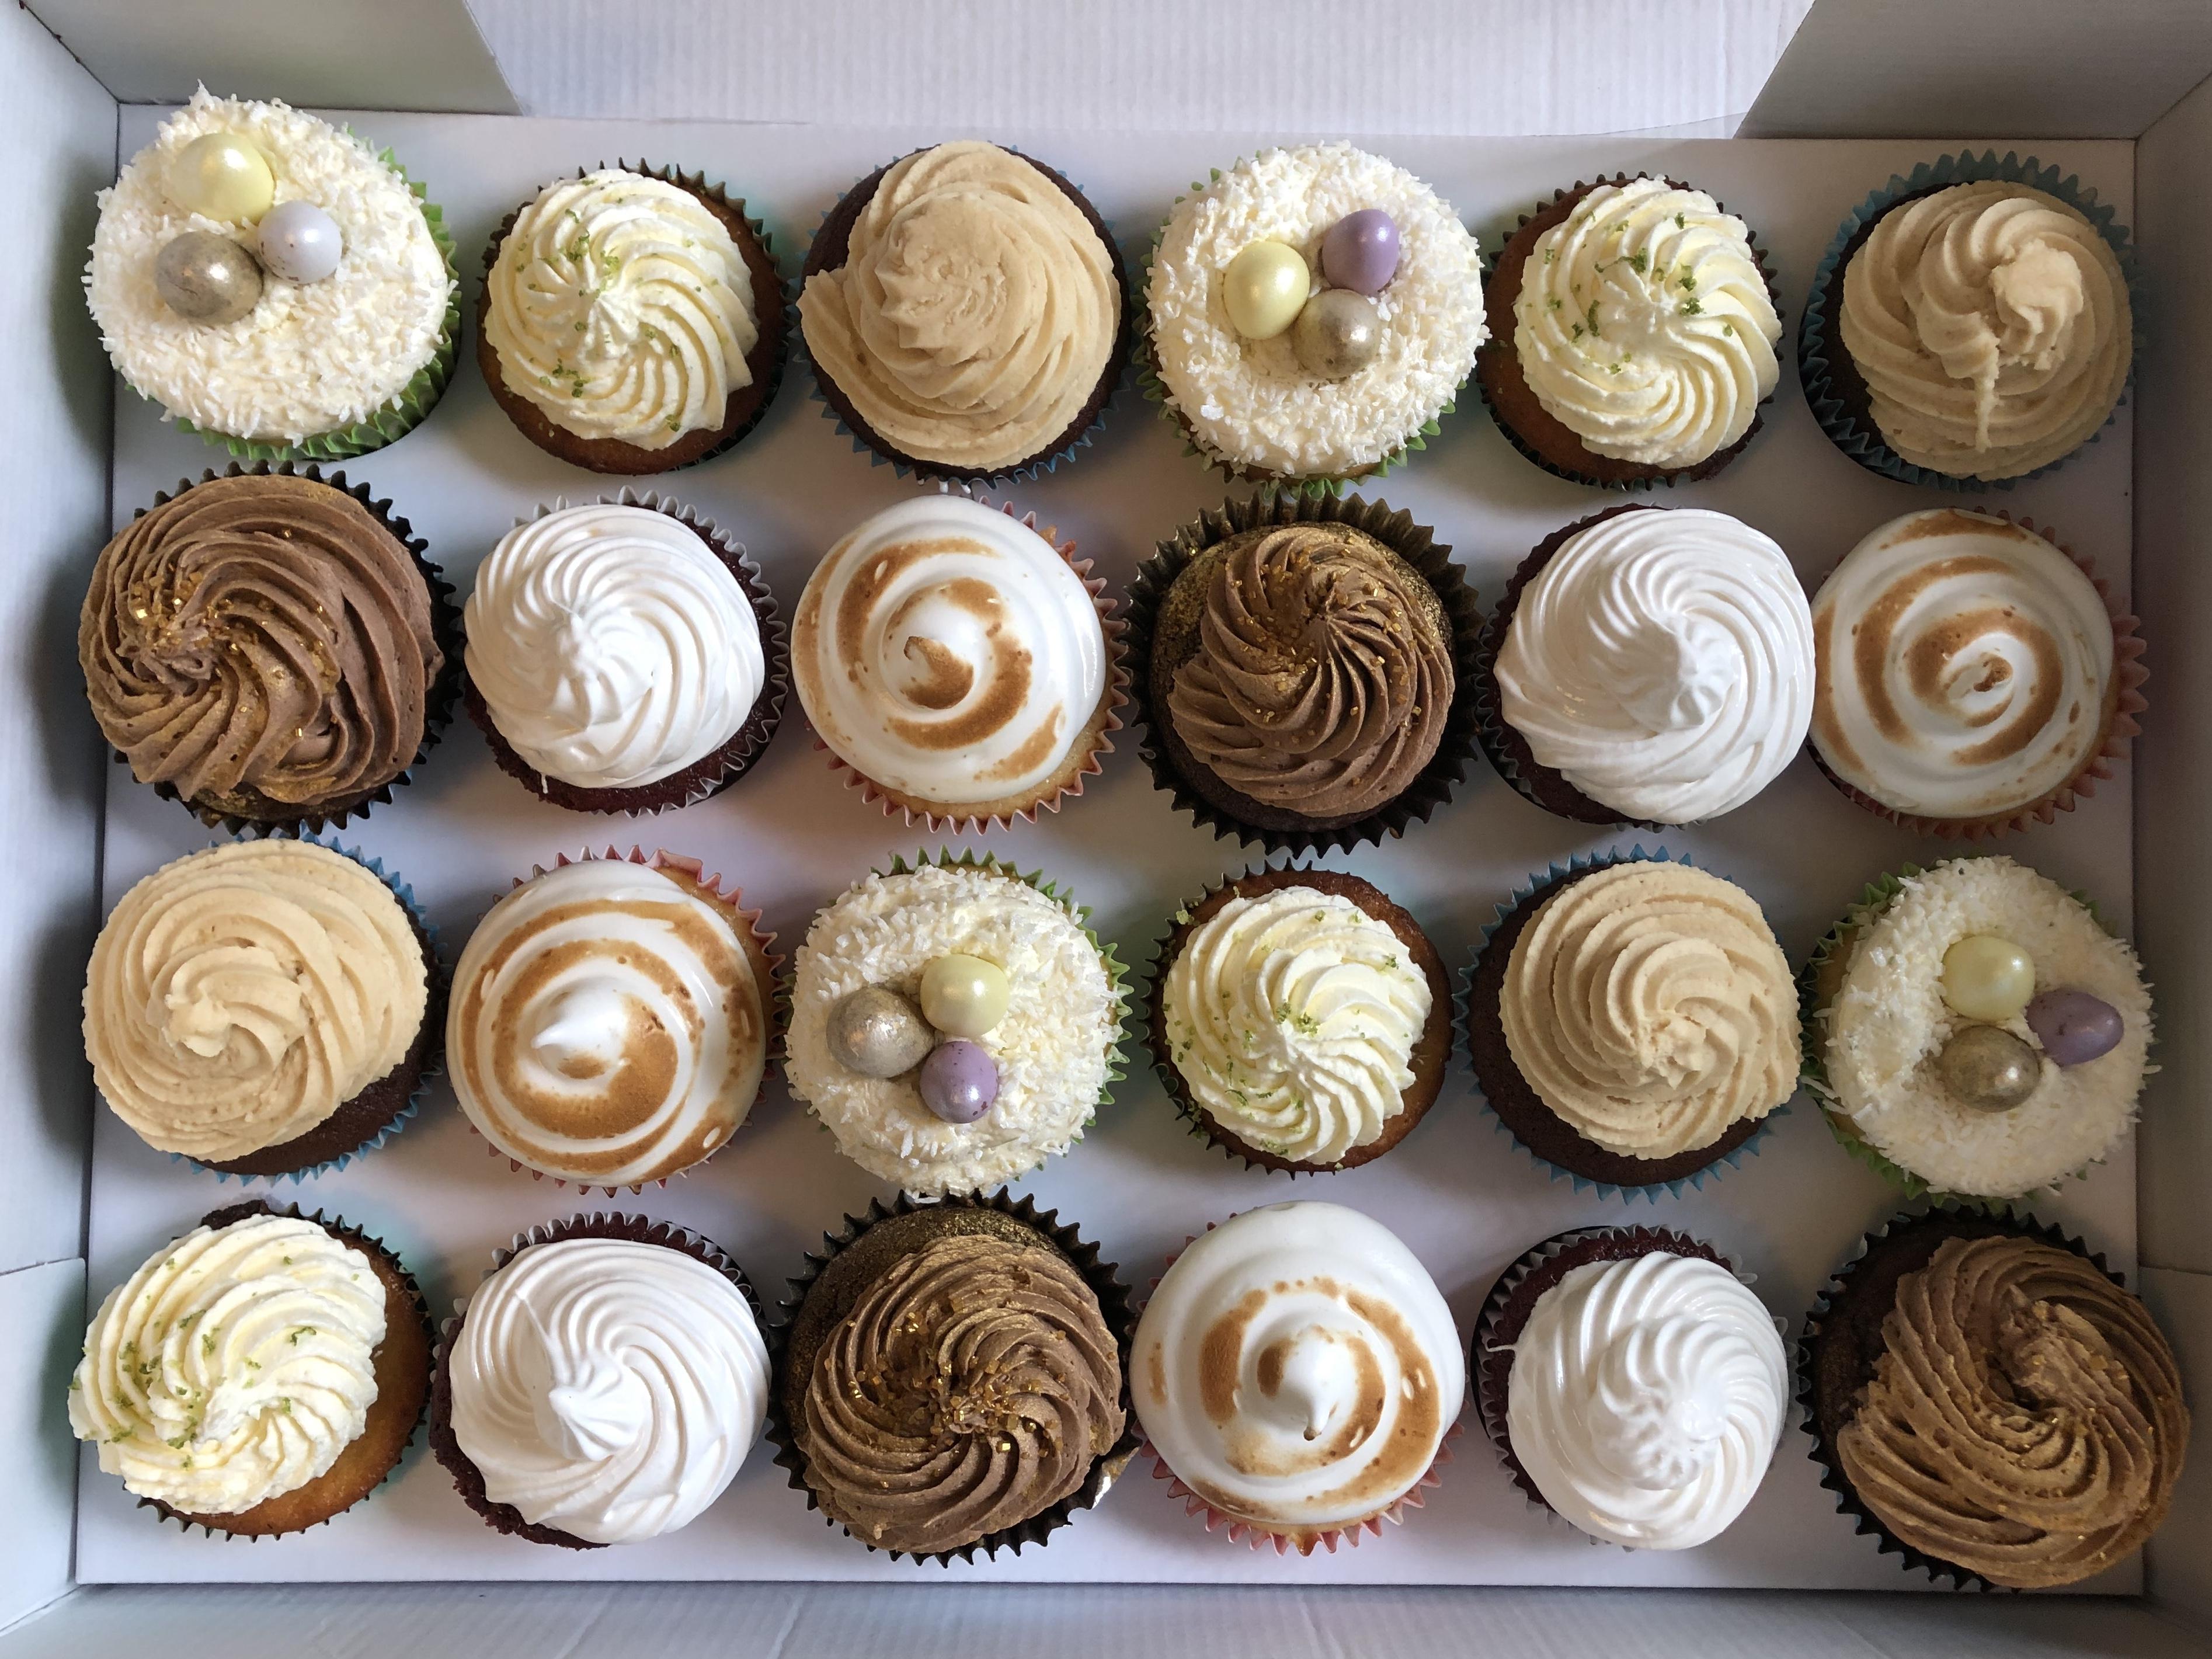 Cupcakes - Mixed Boxes